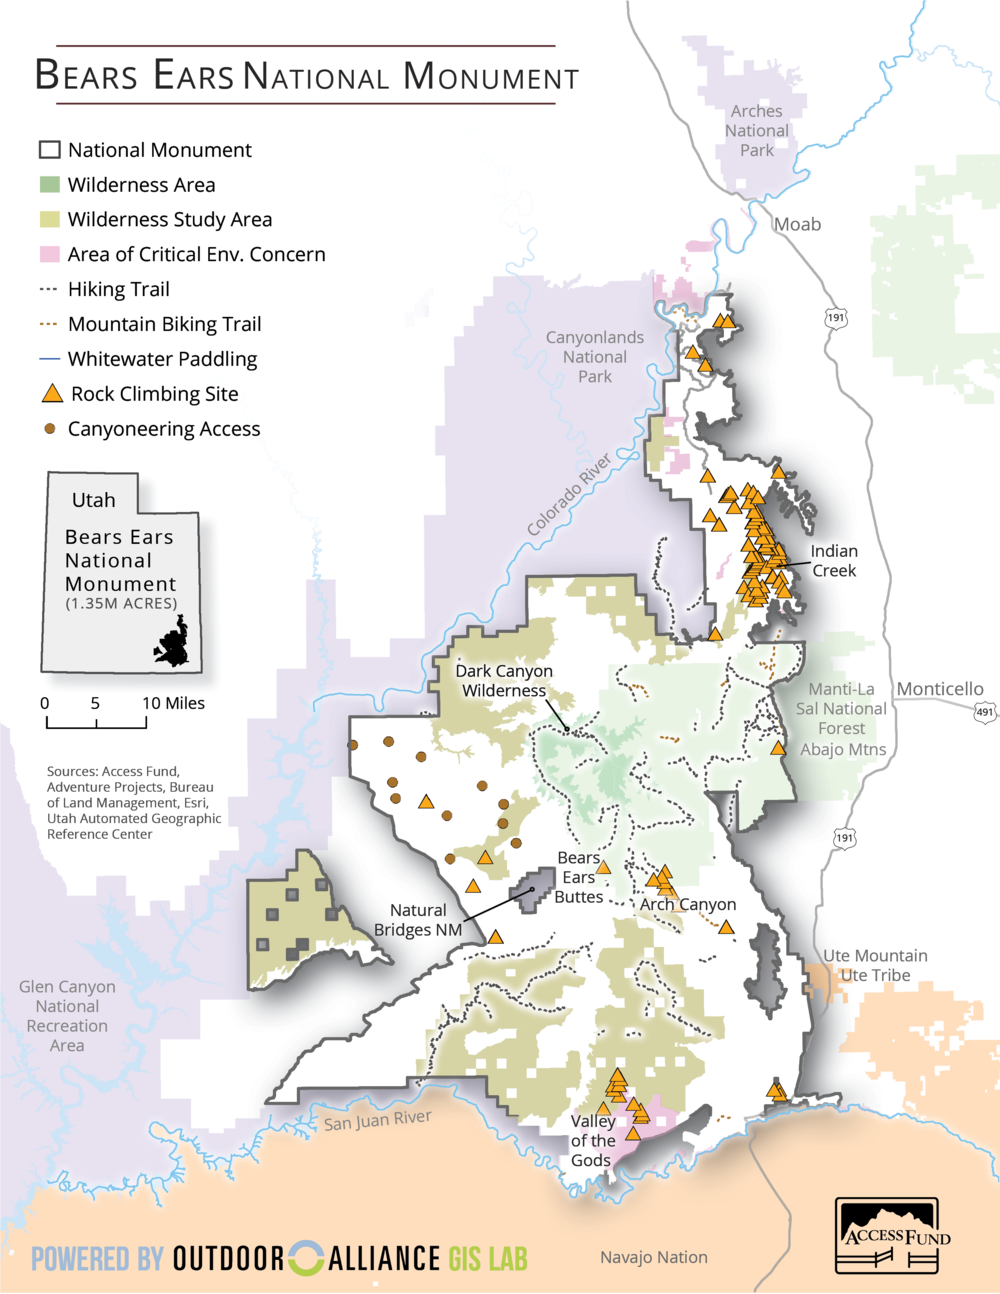 Original boundaries of Bears Ears National Monument, via GIS Lab